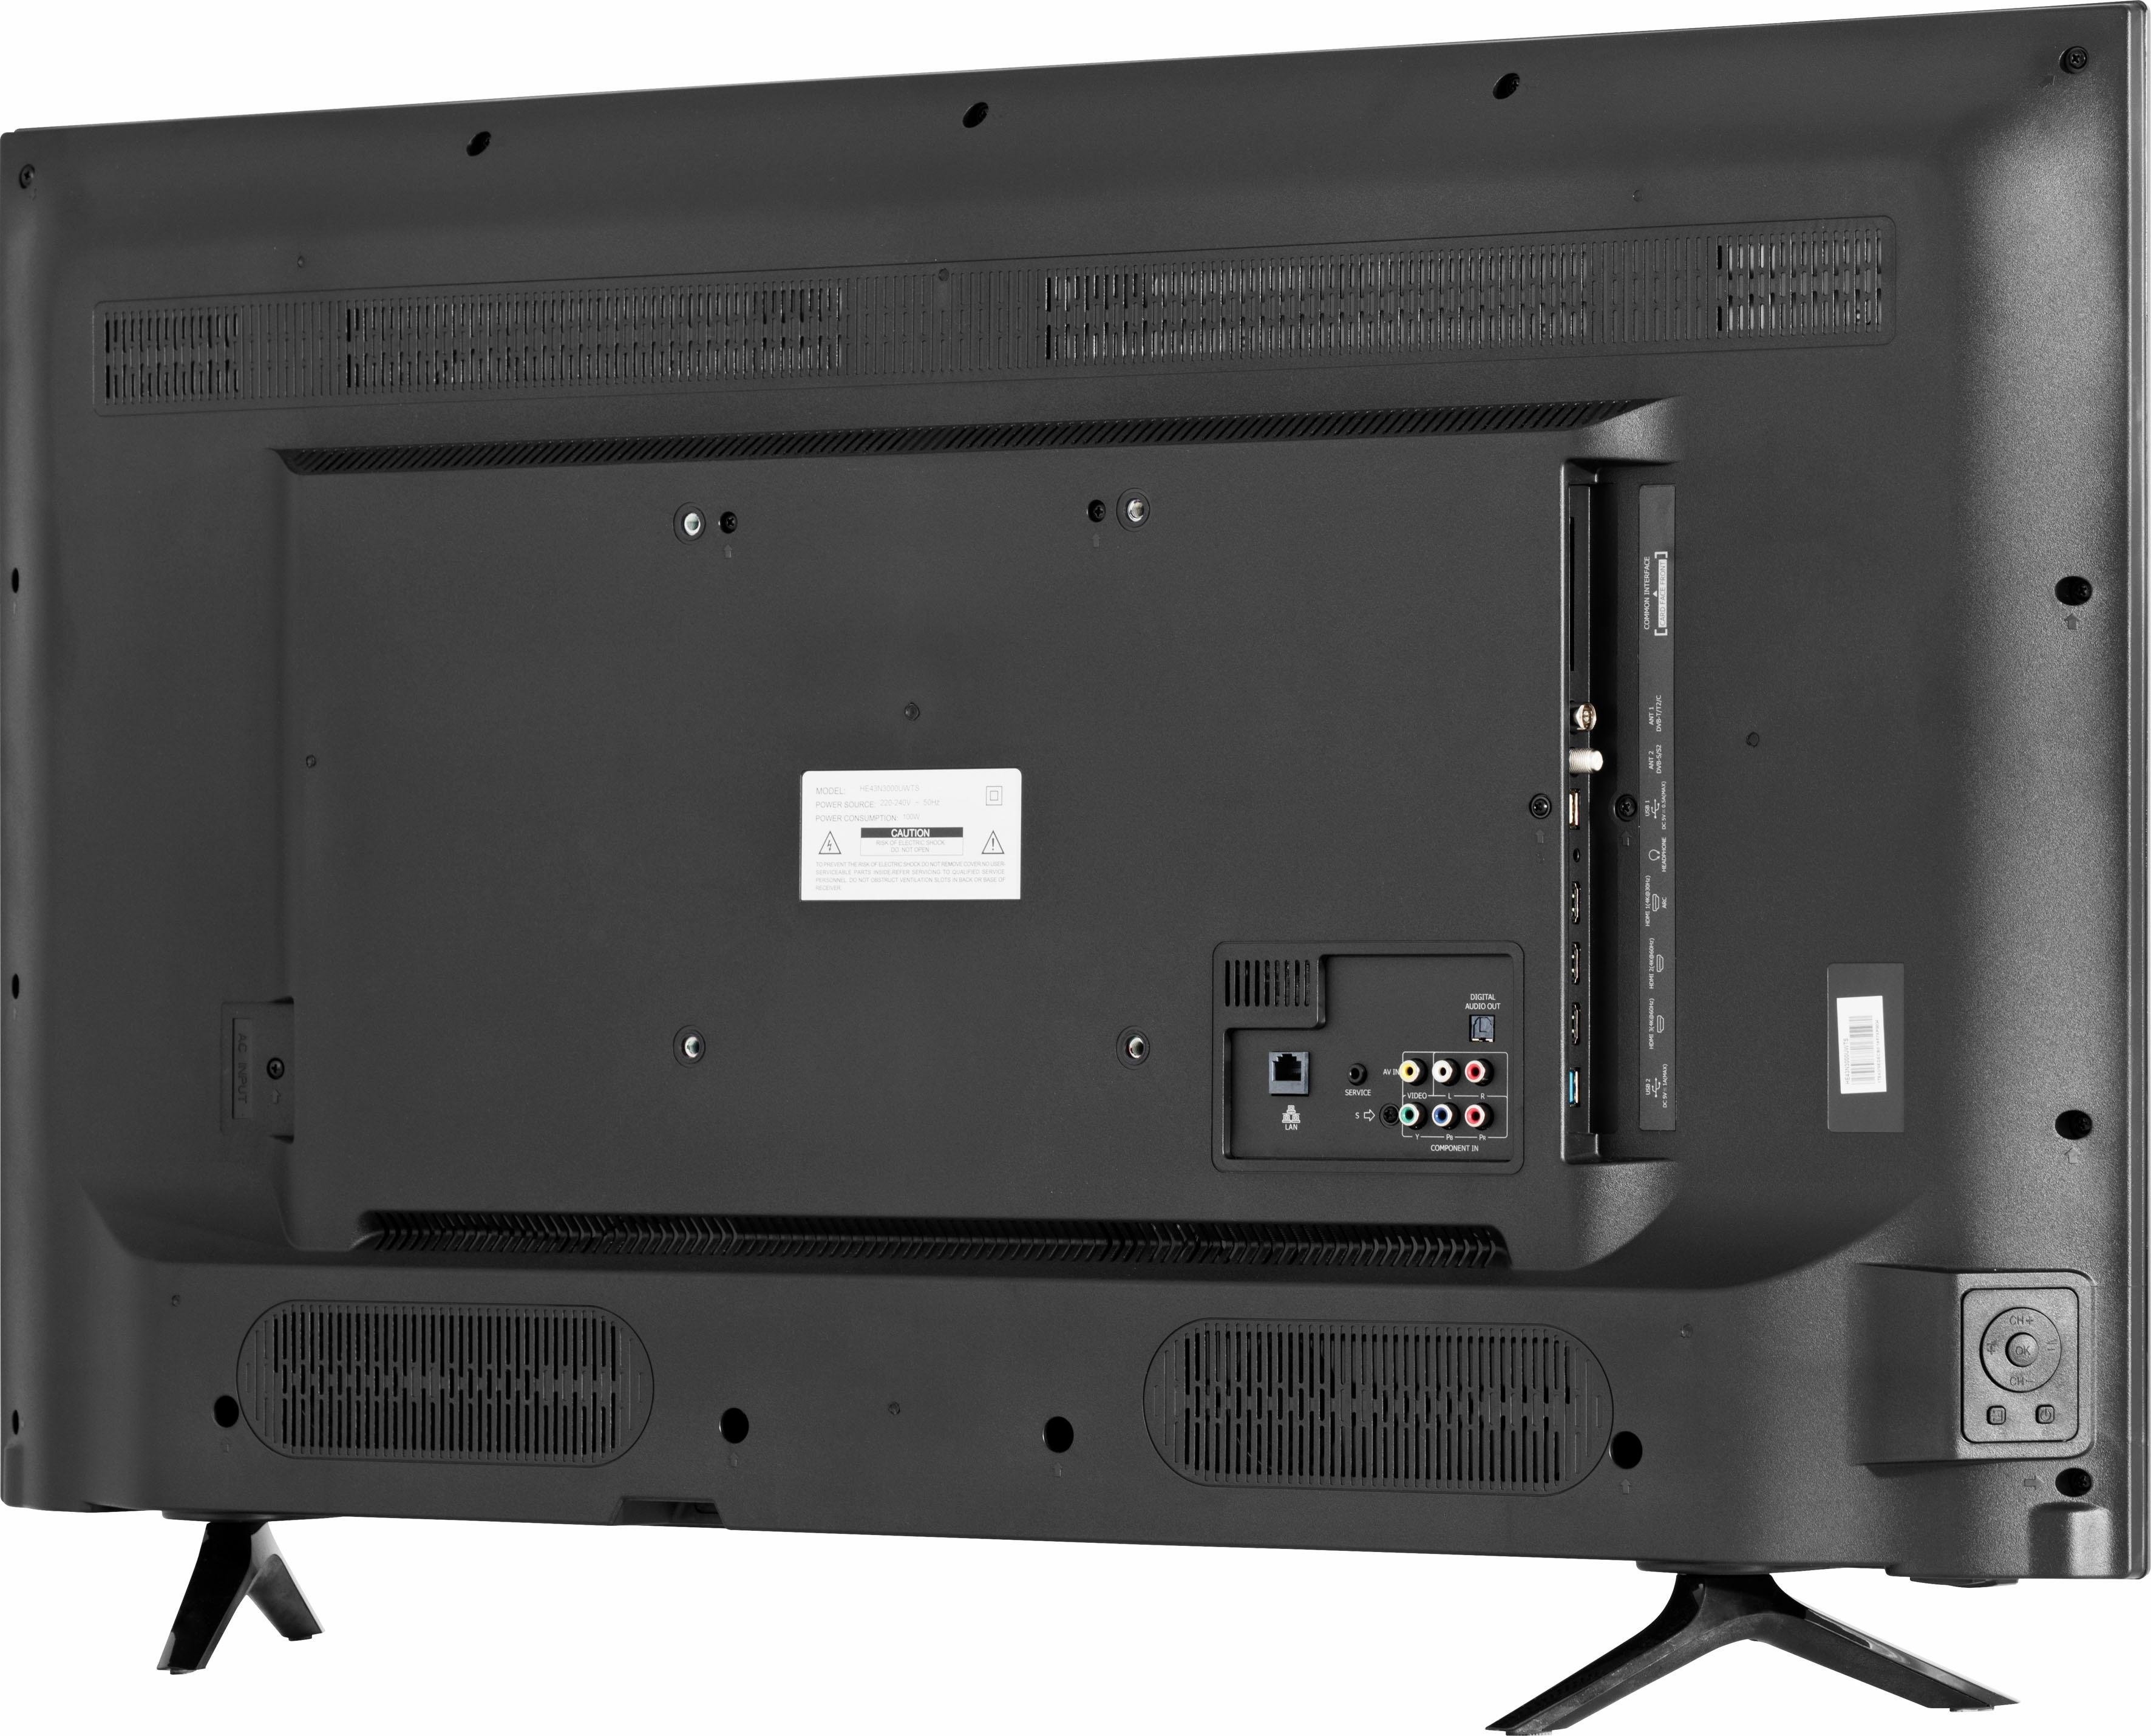 hisense h55nec5205 led tv 138 cm 55 inch uhd 4k smart tv online bestellen otto. Black Bedroom Furniture Sets. Home Design Ideas